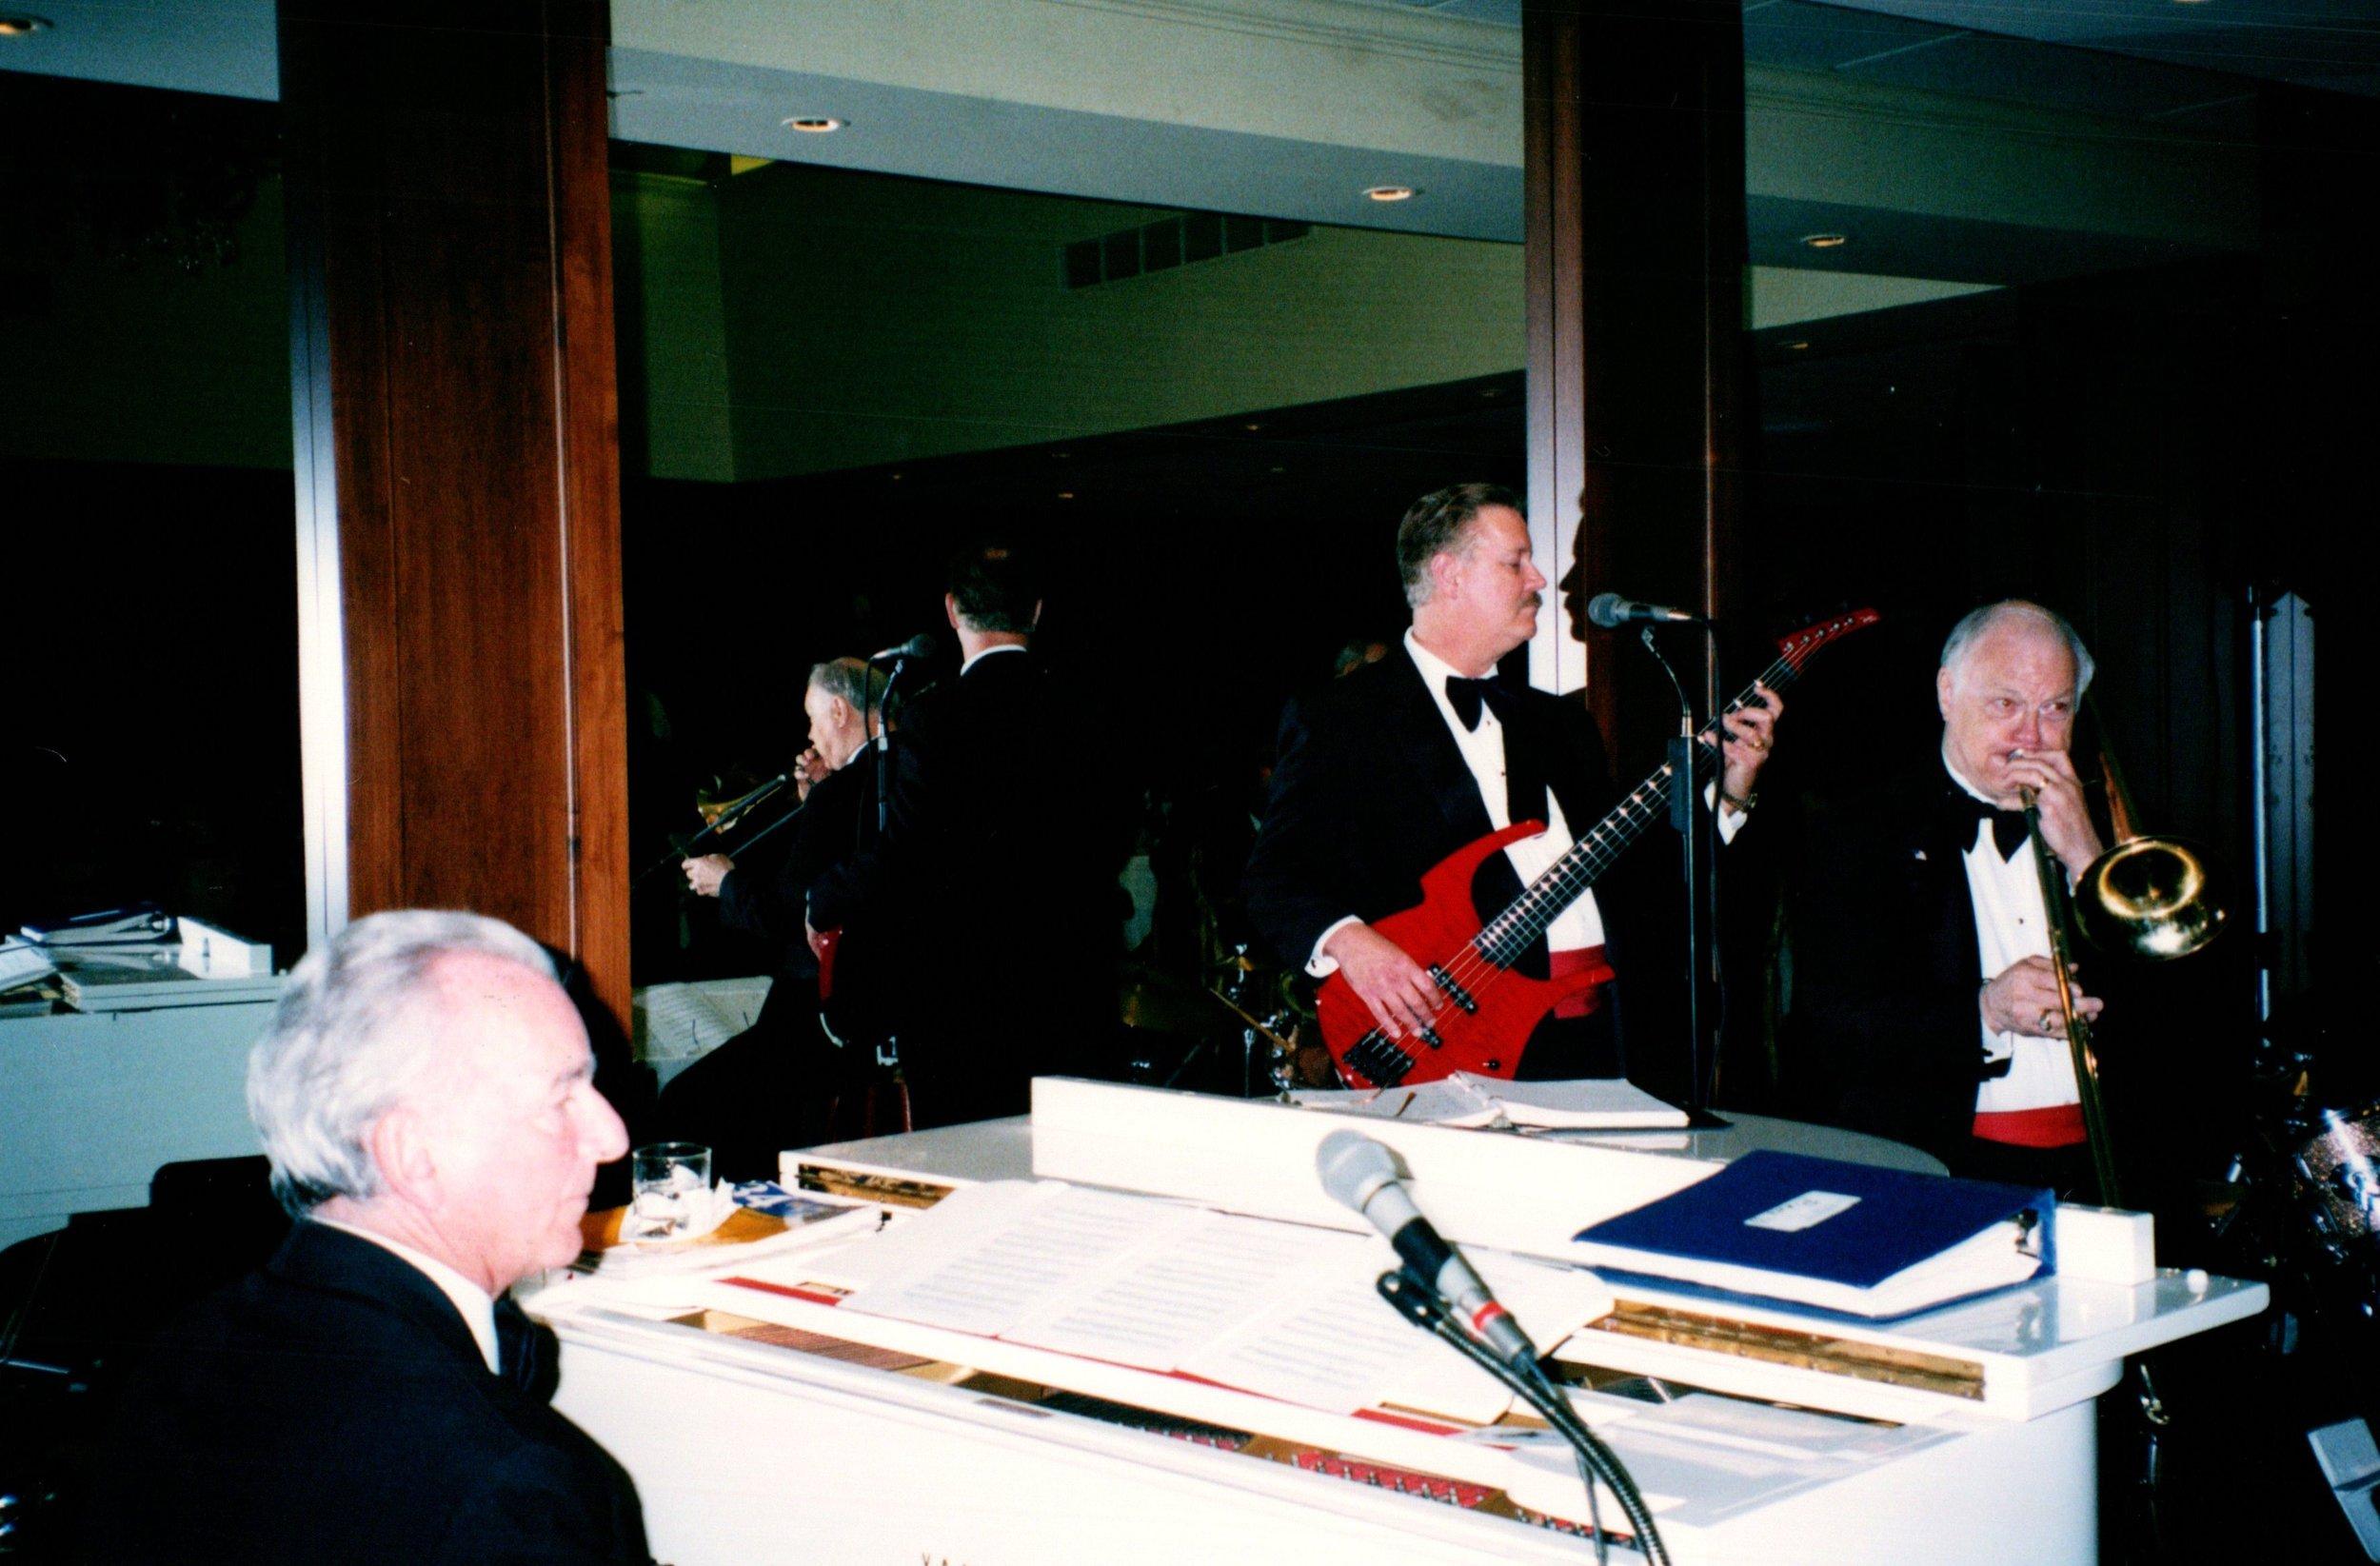 2_11_2002 - HYP DINNER DANCE - VINEYARD COUNTRY CLUB 15.jpg